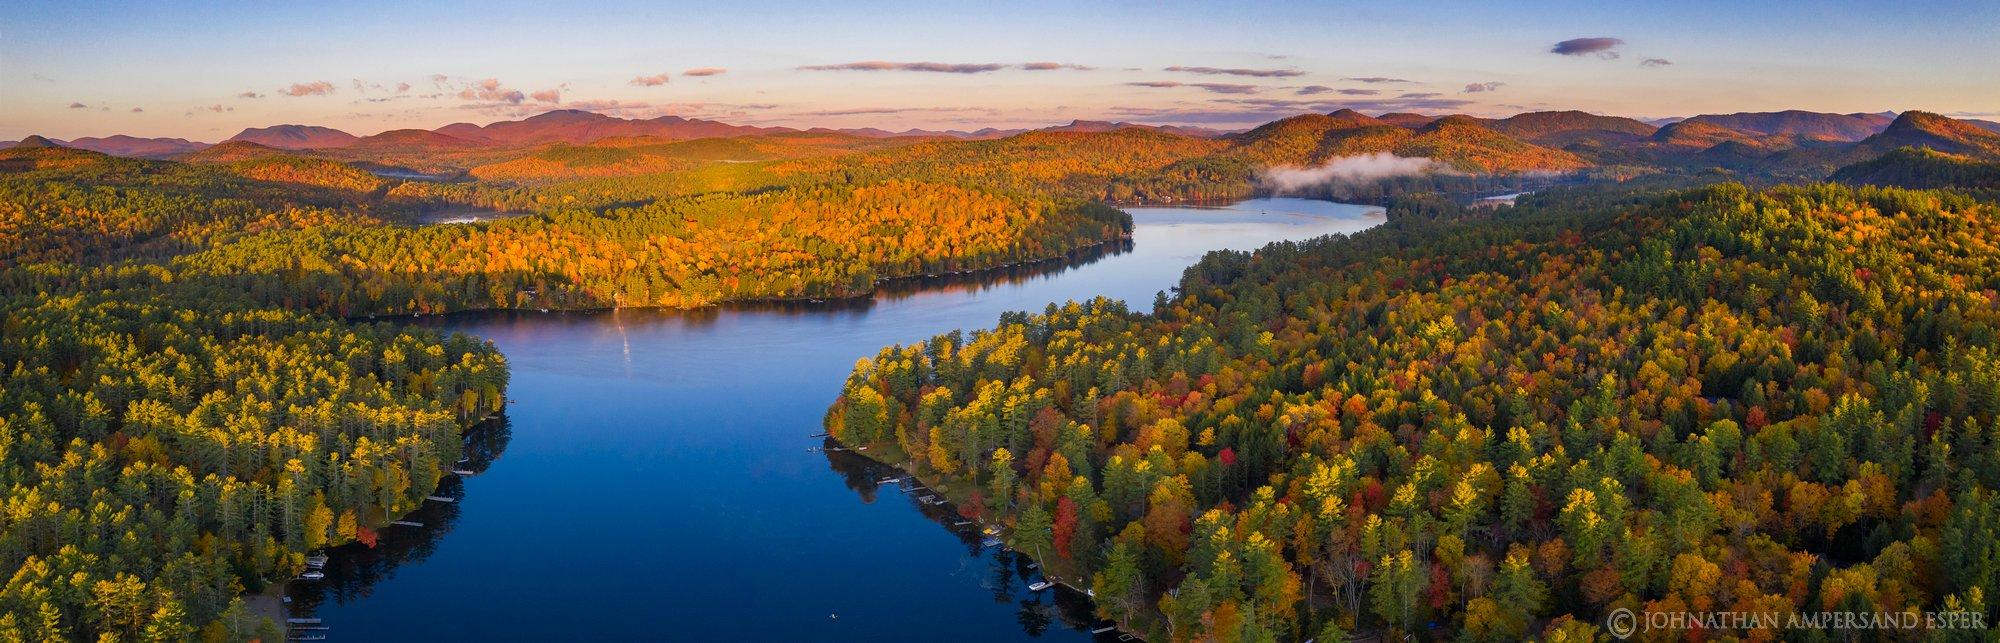 Loon Lake,drone,fall,2019,autumn,panorama,drone panorama,Gore Mt,